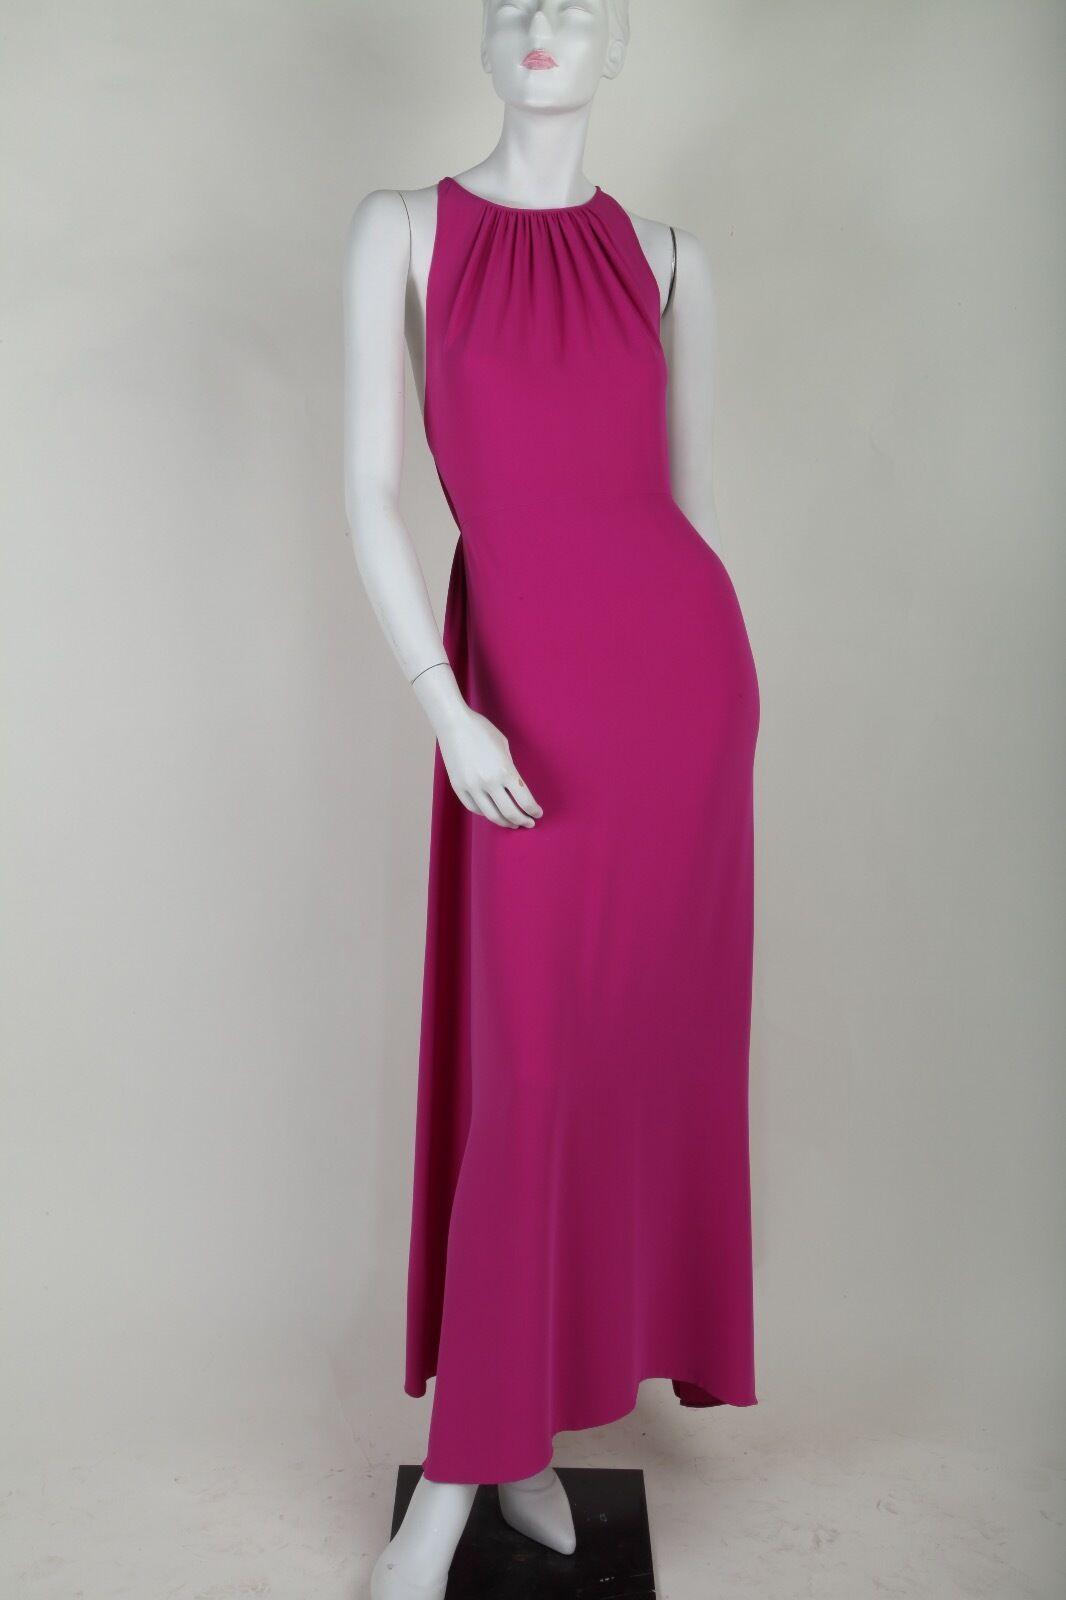 Vintage Oscar De La Renta Pink Draped Gown